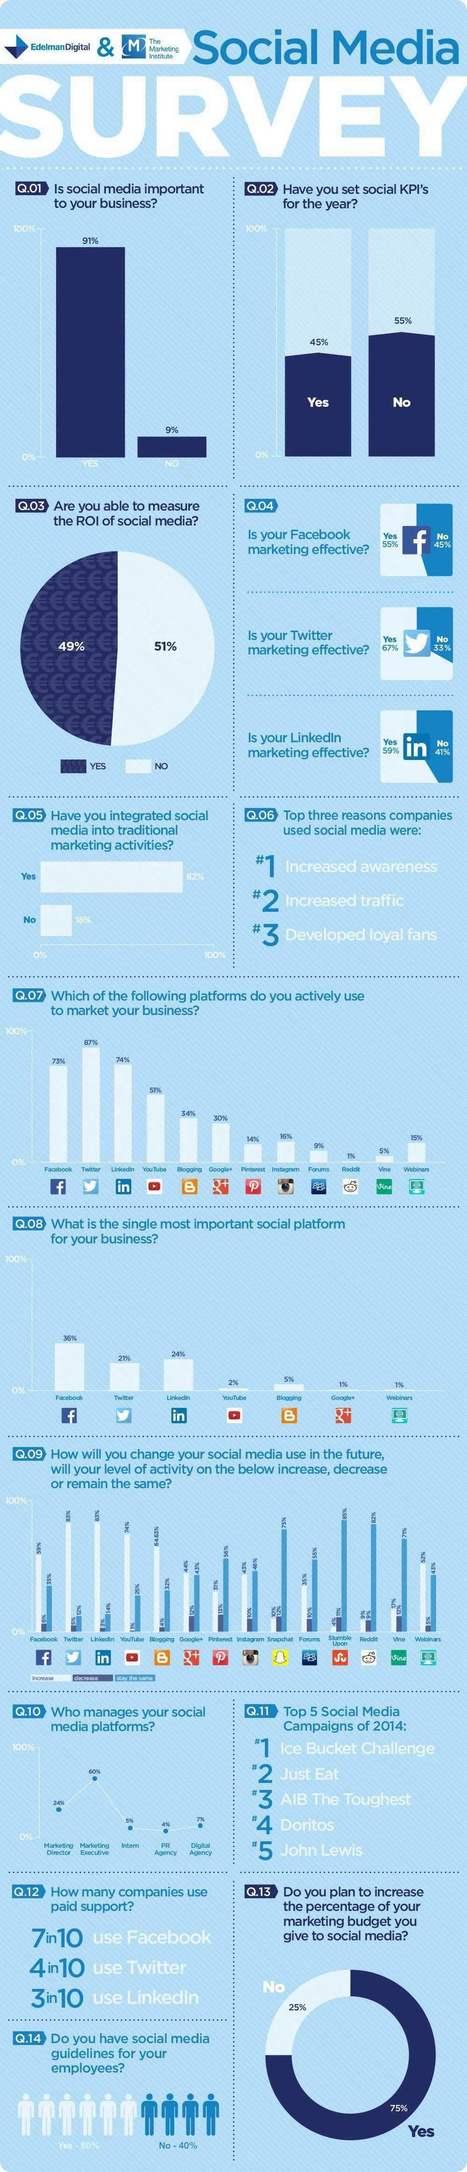 Social Media Survey #SocialOutlook15 - Edelman Ireland | Social Media ePower Marketing | Scoop.it